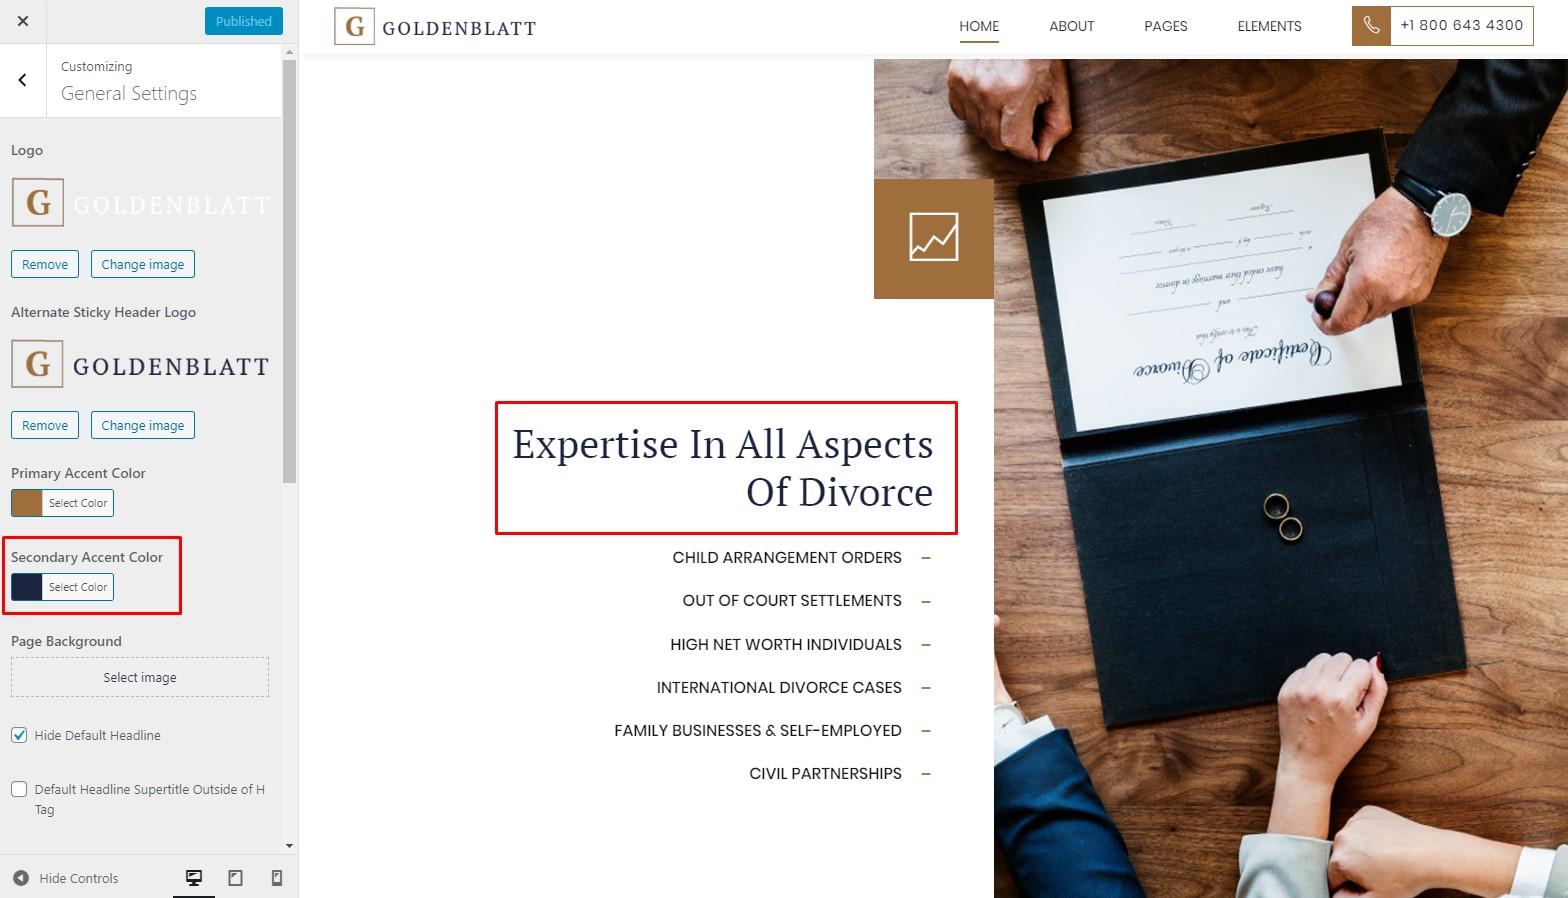 https://documentation.bold-themes.com/goldenblatt/wp-content/uploads/sites/51/2019/11/alt-color.jpg